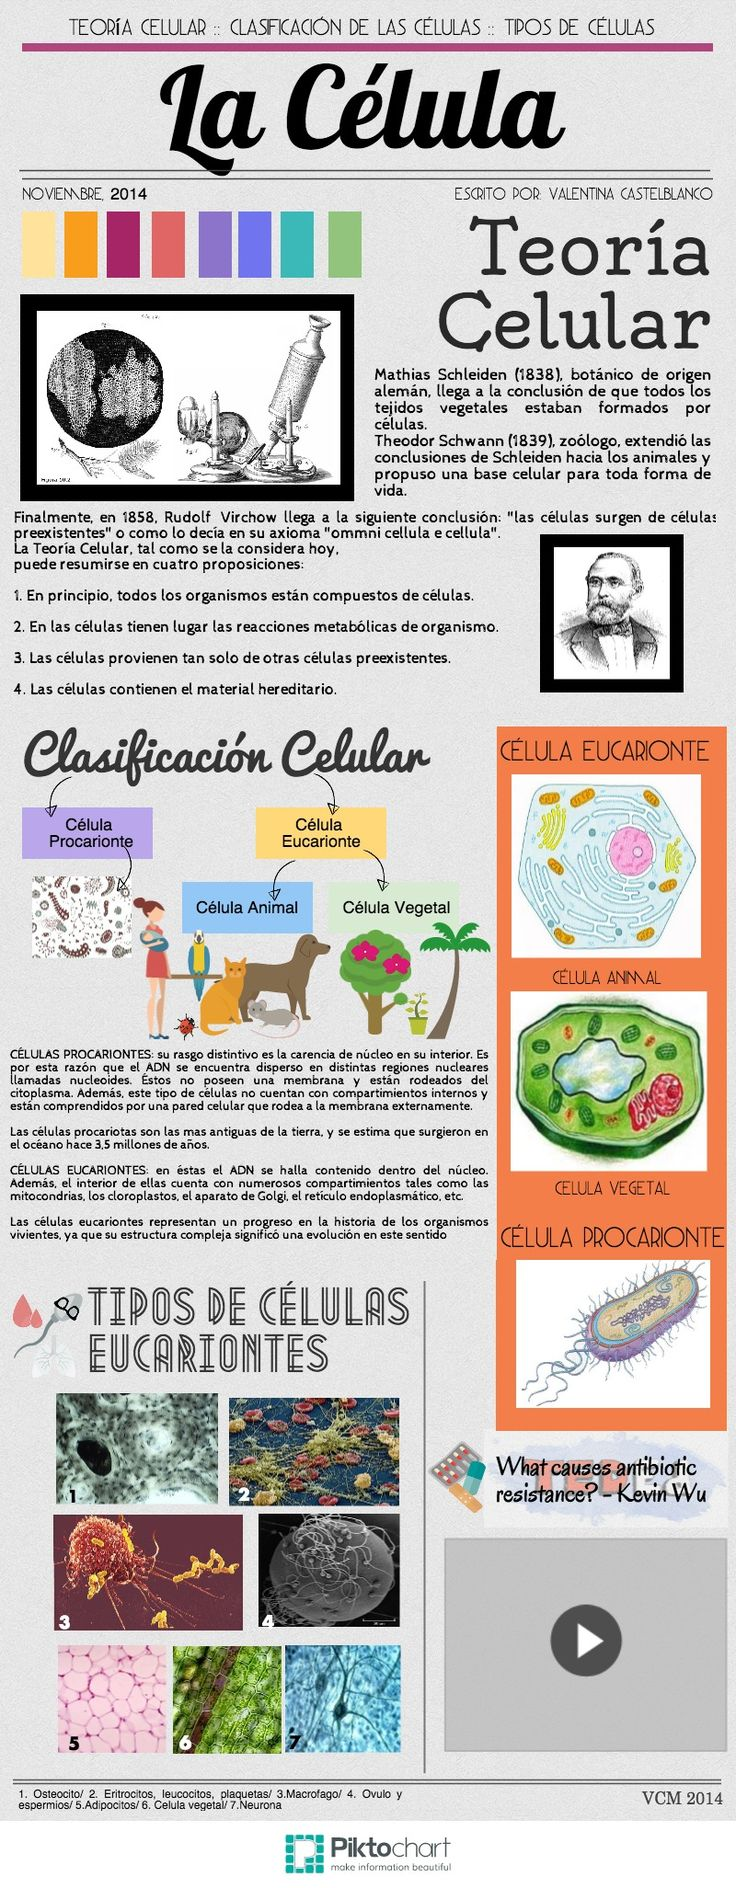 La Célula | @Piktochart Infographic Valentina Castelblanco